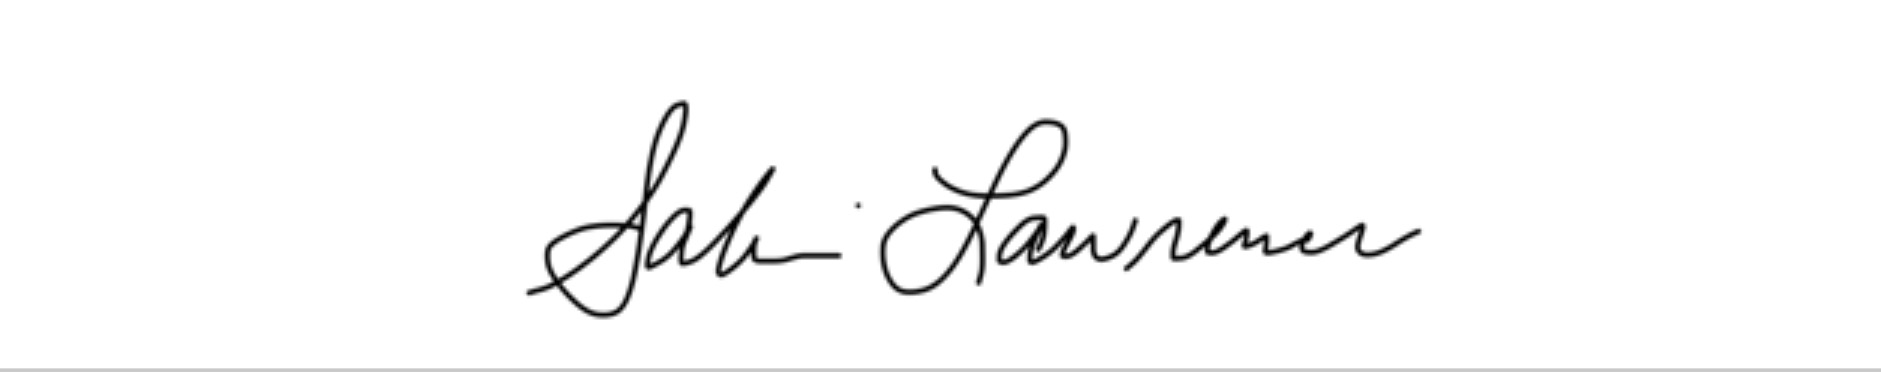 Sabrina Lawrence's Signature